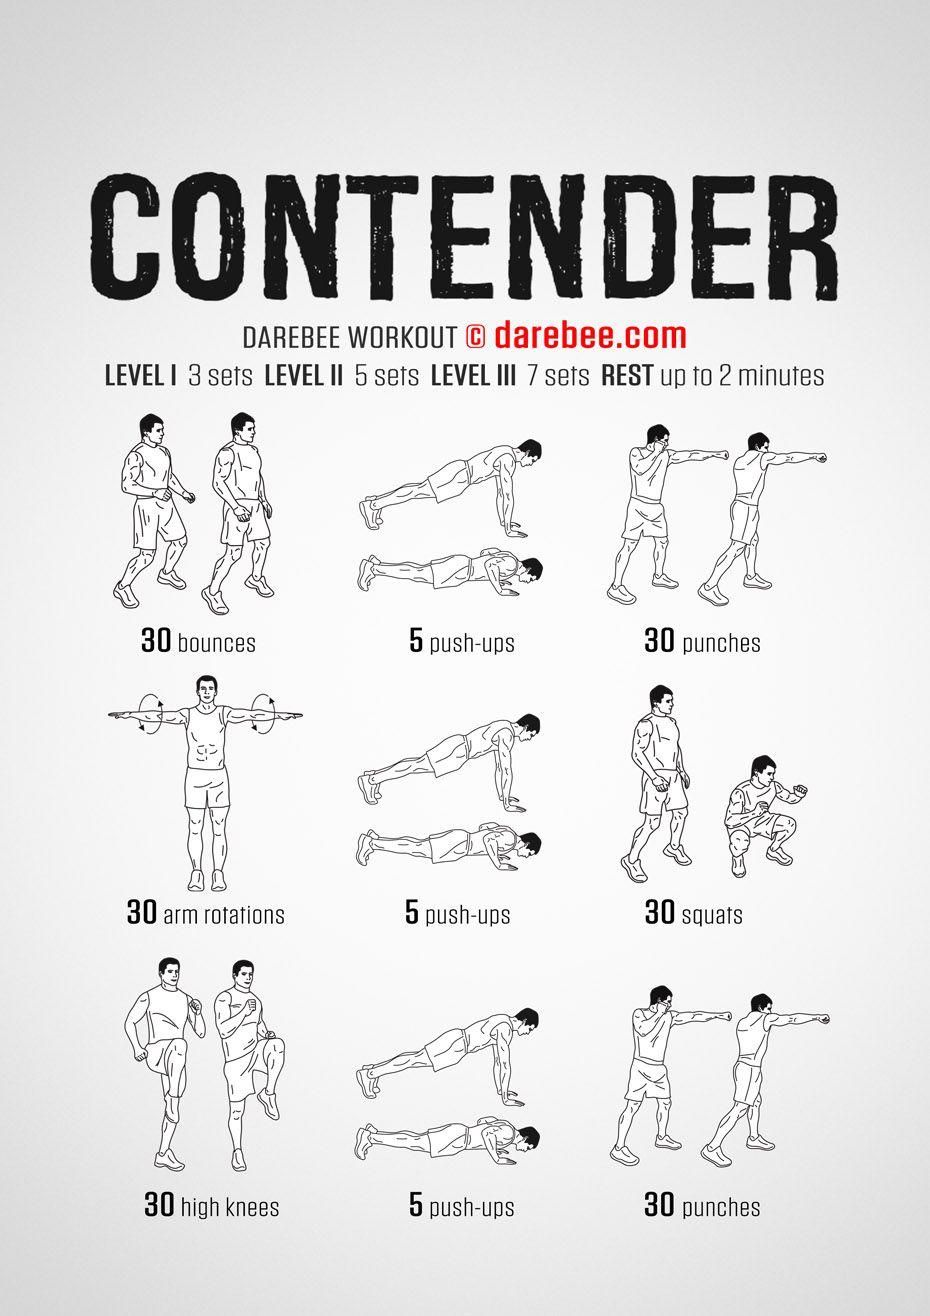 Contender Workout   Aerobics workout, Darebee, Superhero ...